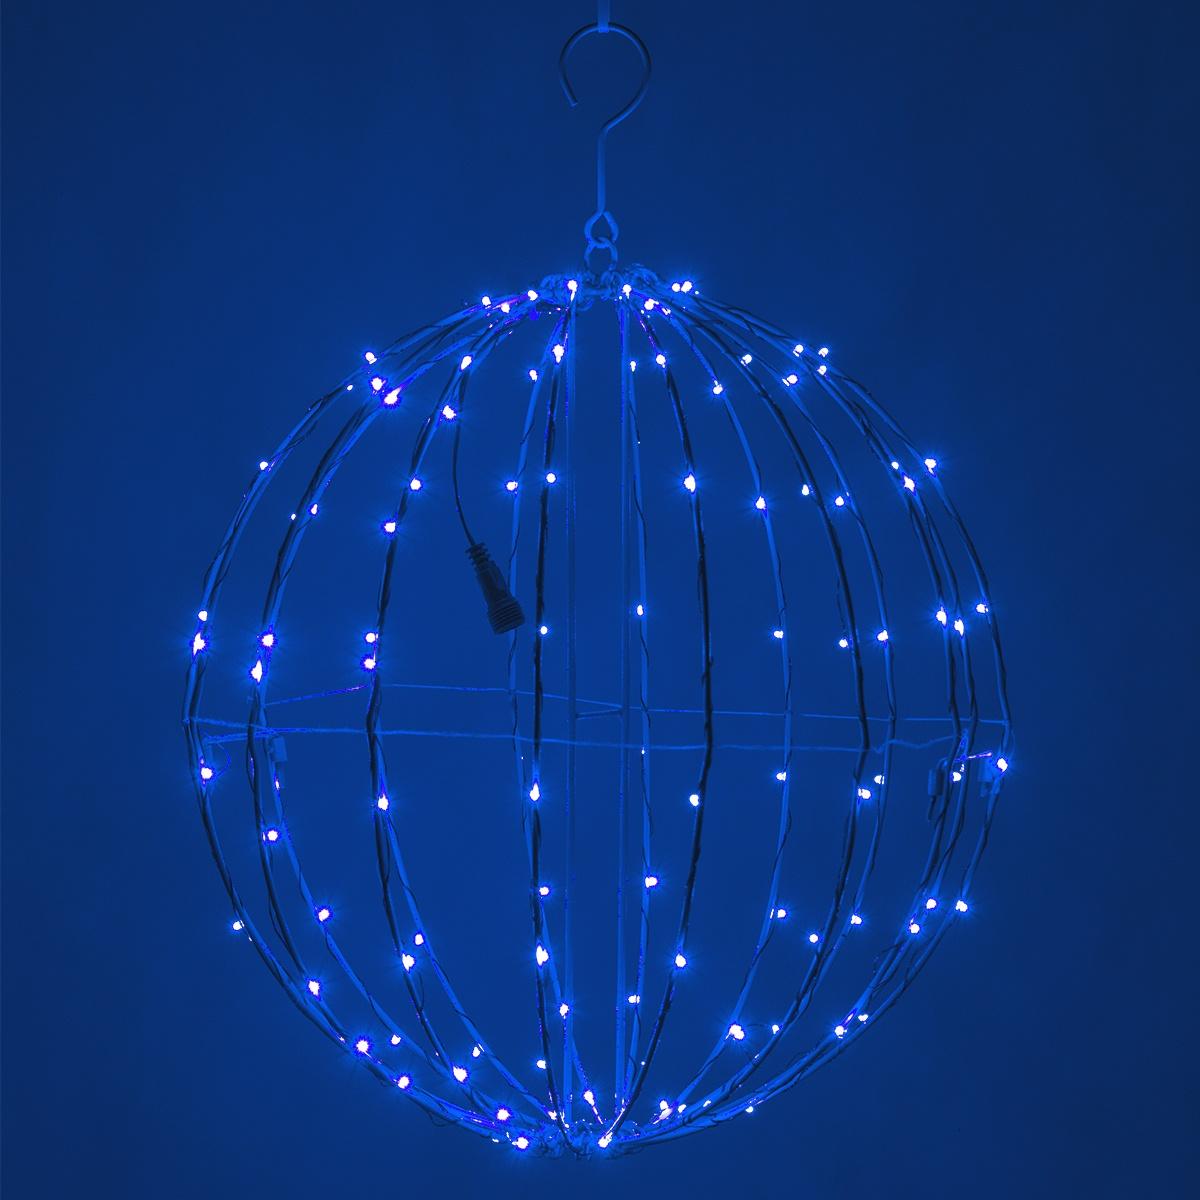 Fairy Light Ball Fold Flat Blue Frame Blue Led Yard Envy